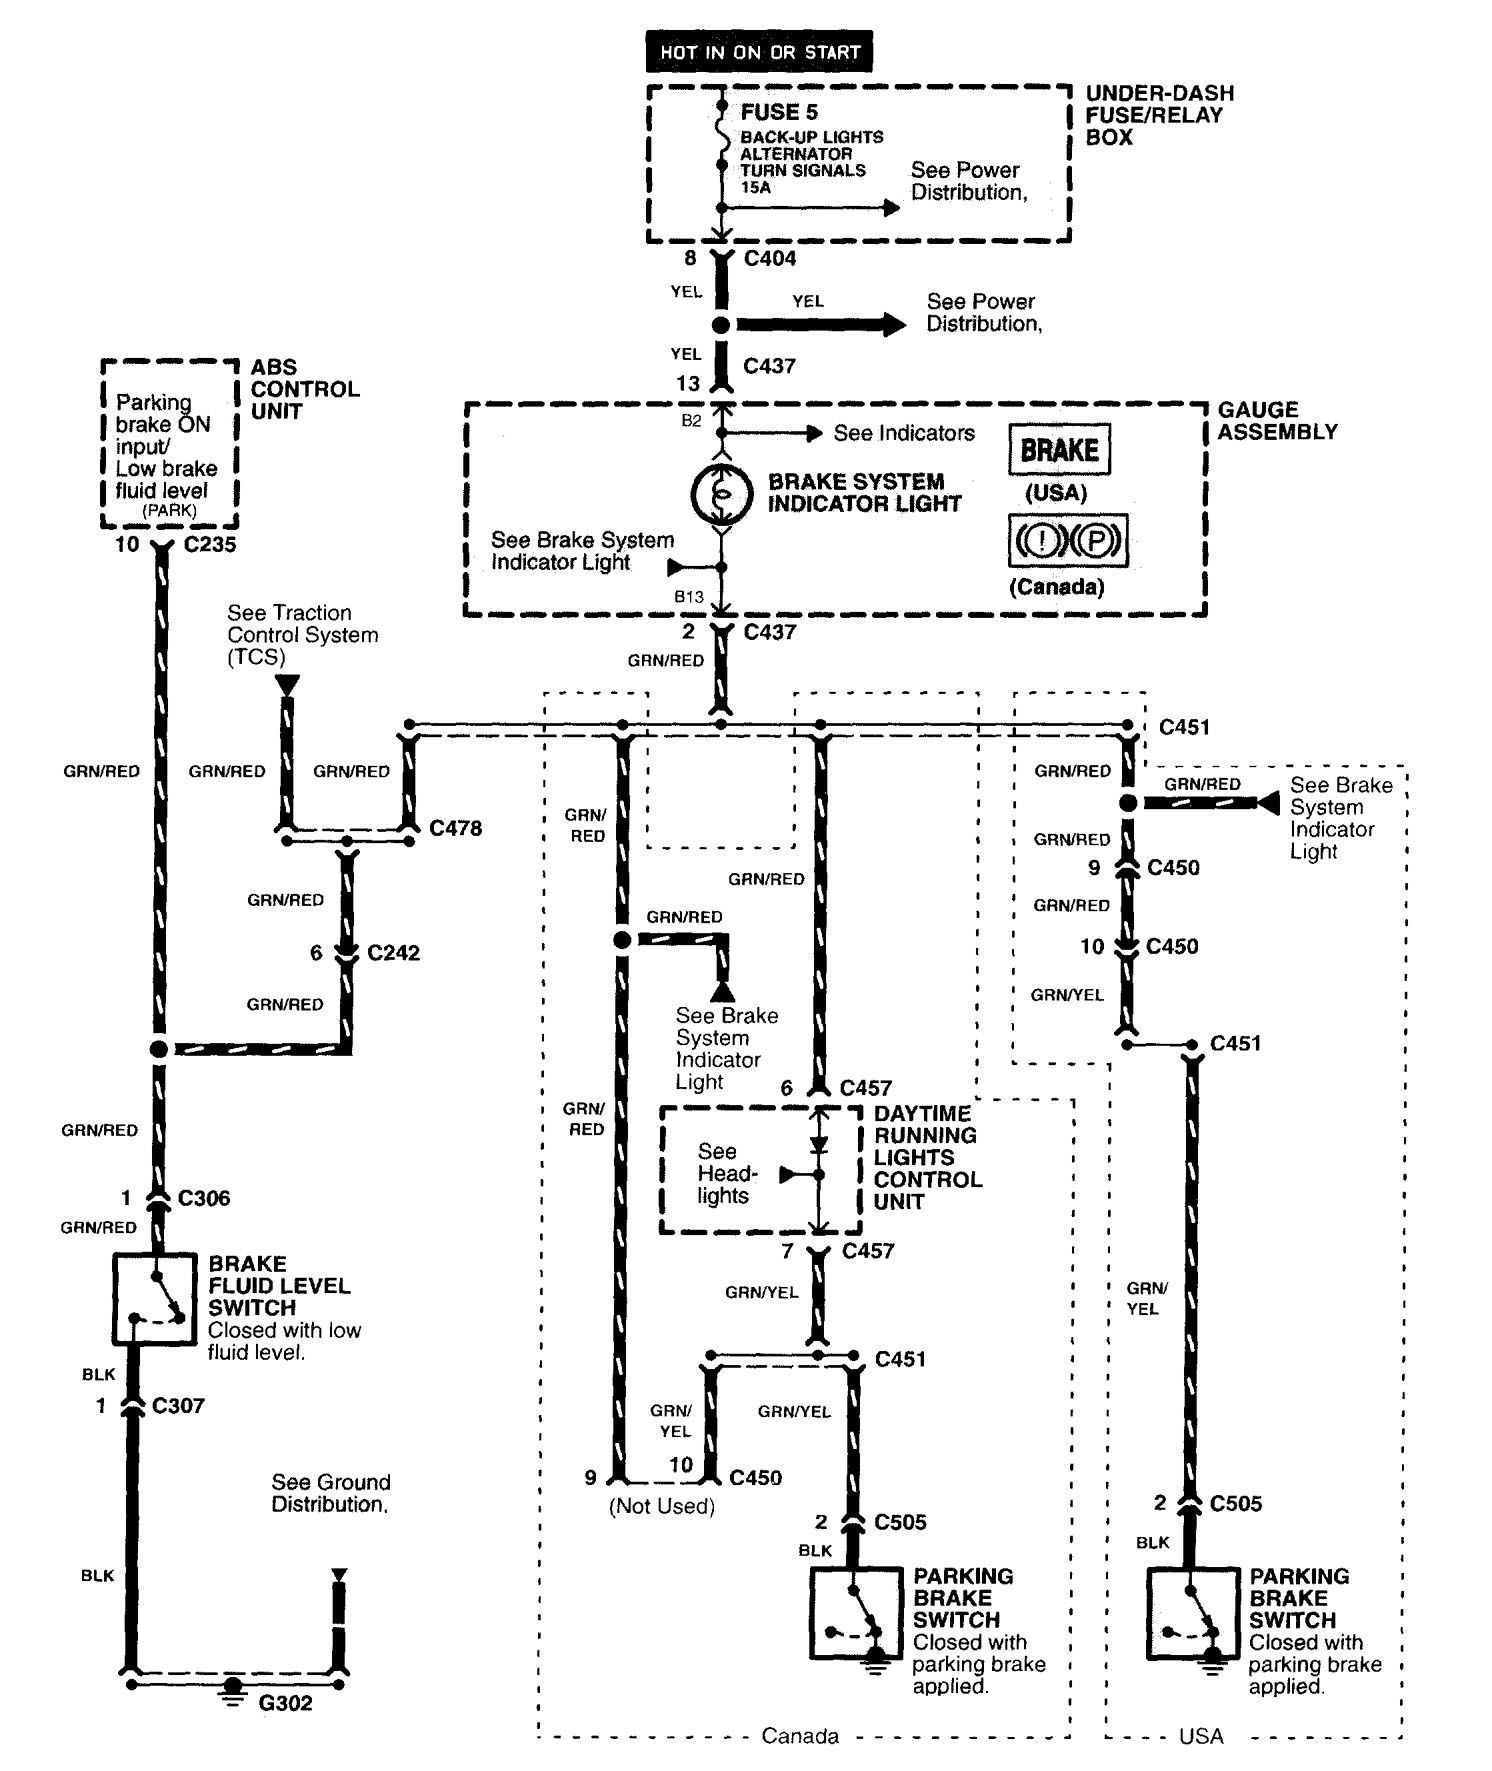 Emergency Brake Diagram Astonishing Parking Switch Wiring Best Image Of